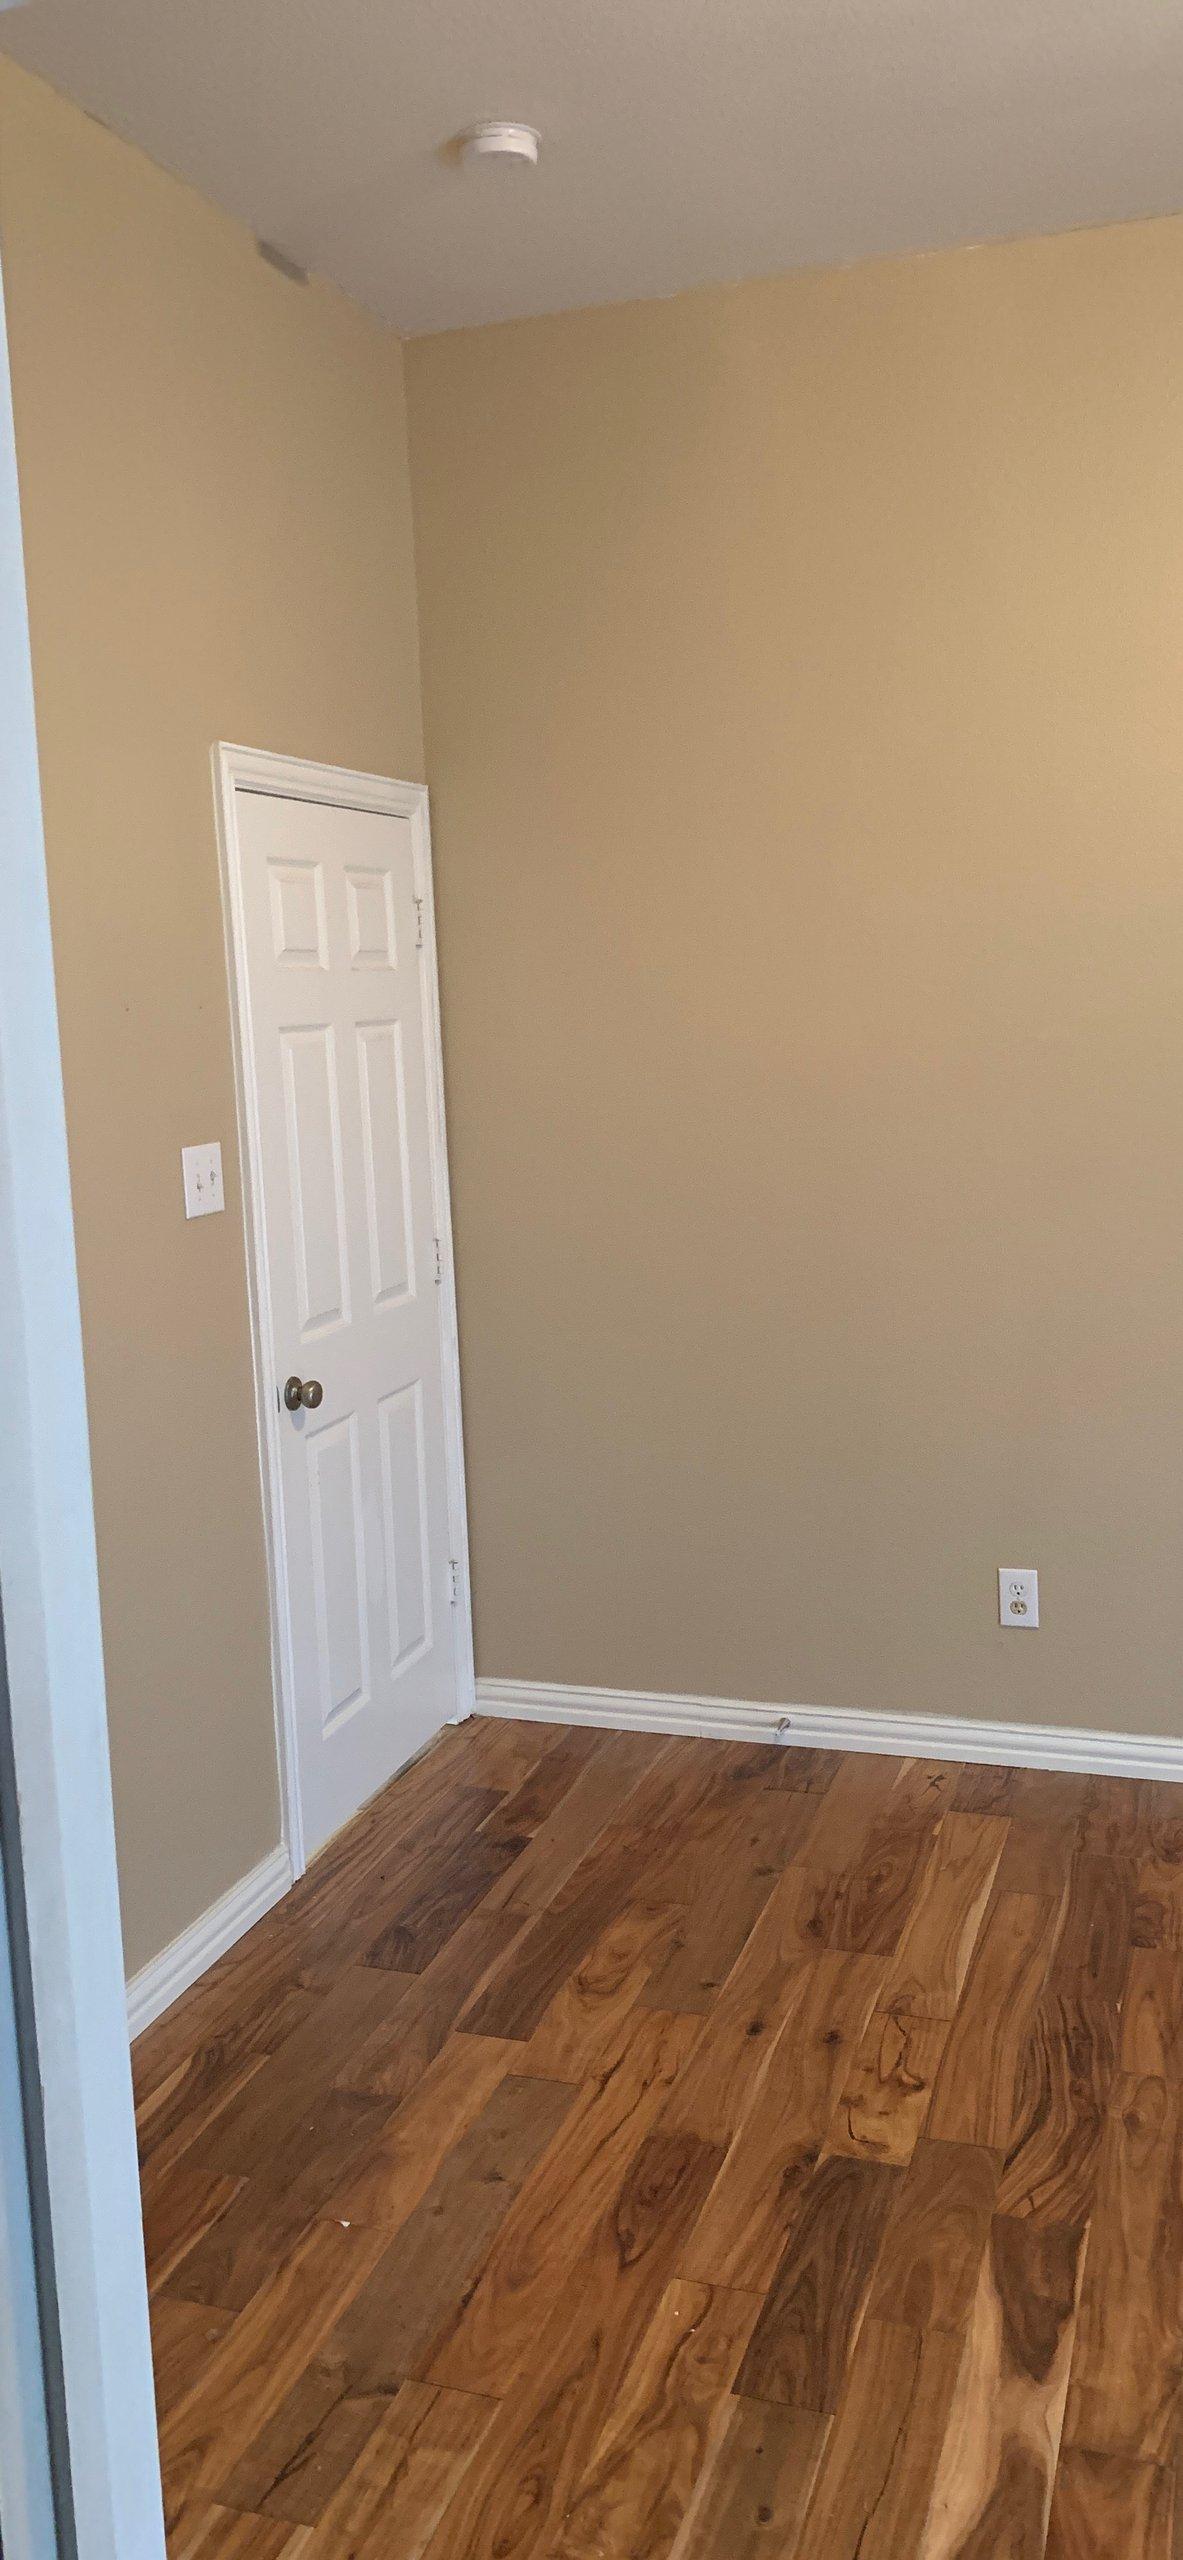 14x11 Bedroom self storage unit